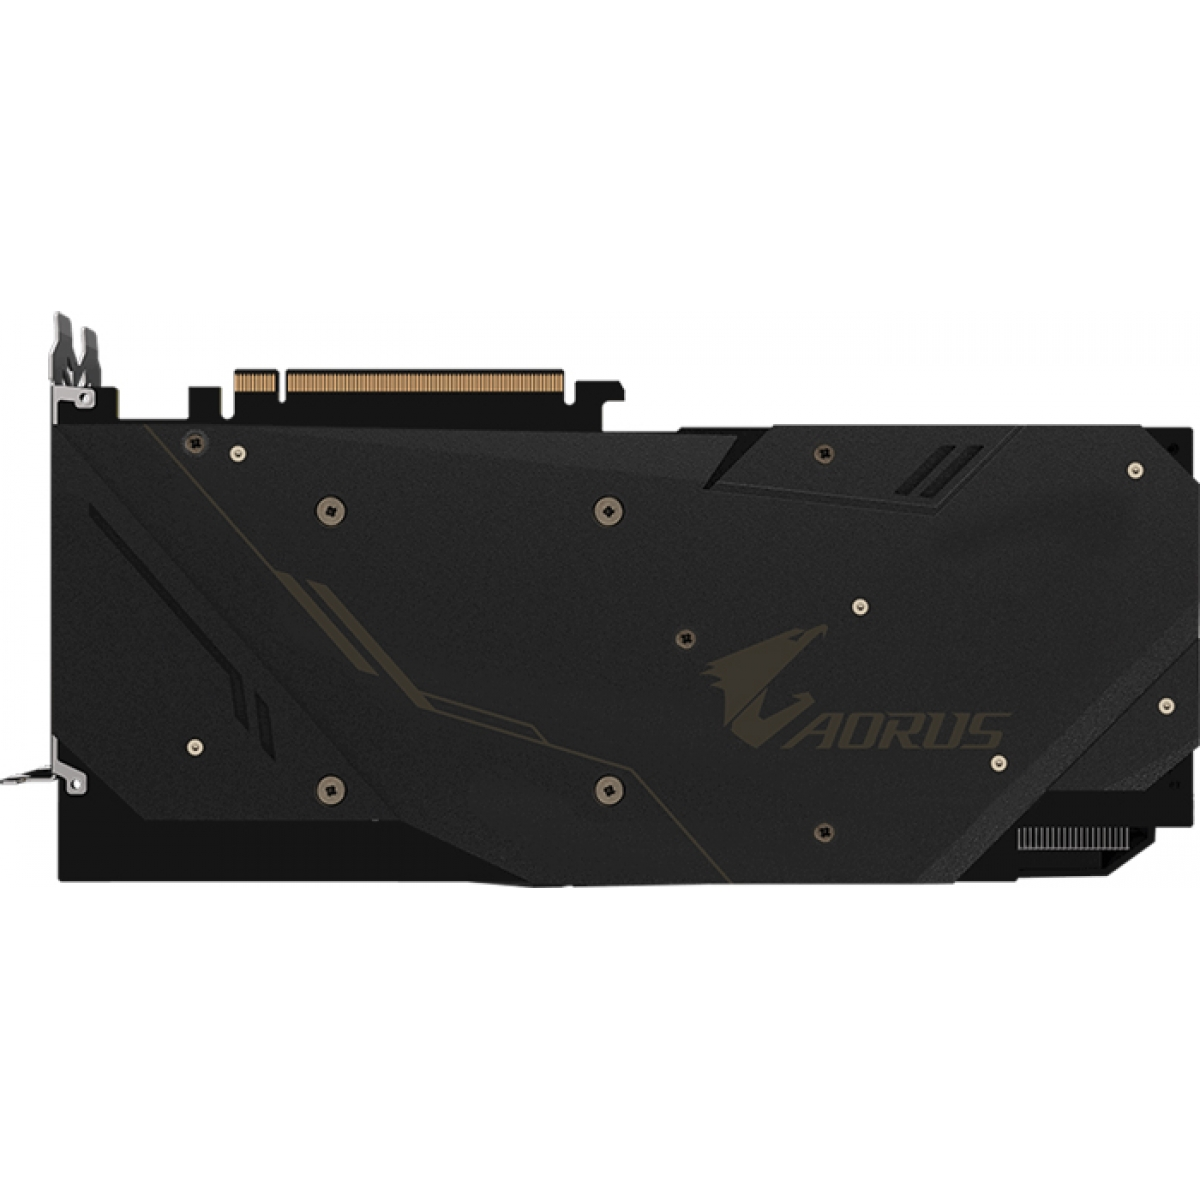 Placa De Vídeo Gigabyte Geforce RTX 2070, 8GB GDDR6, 256Bit